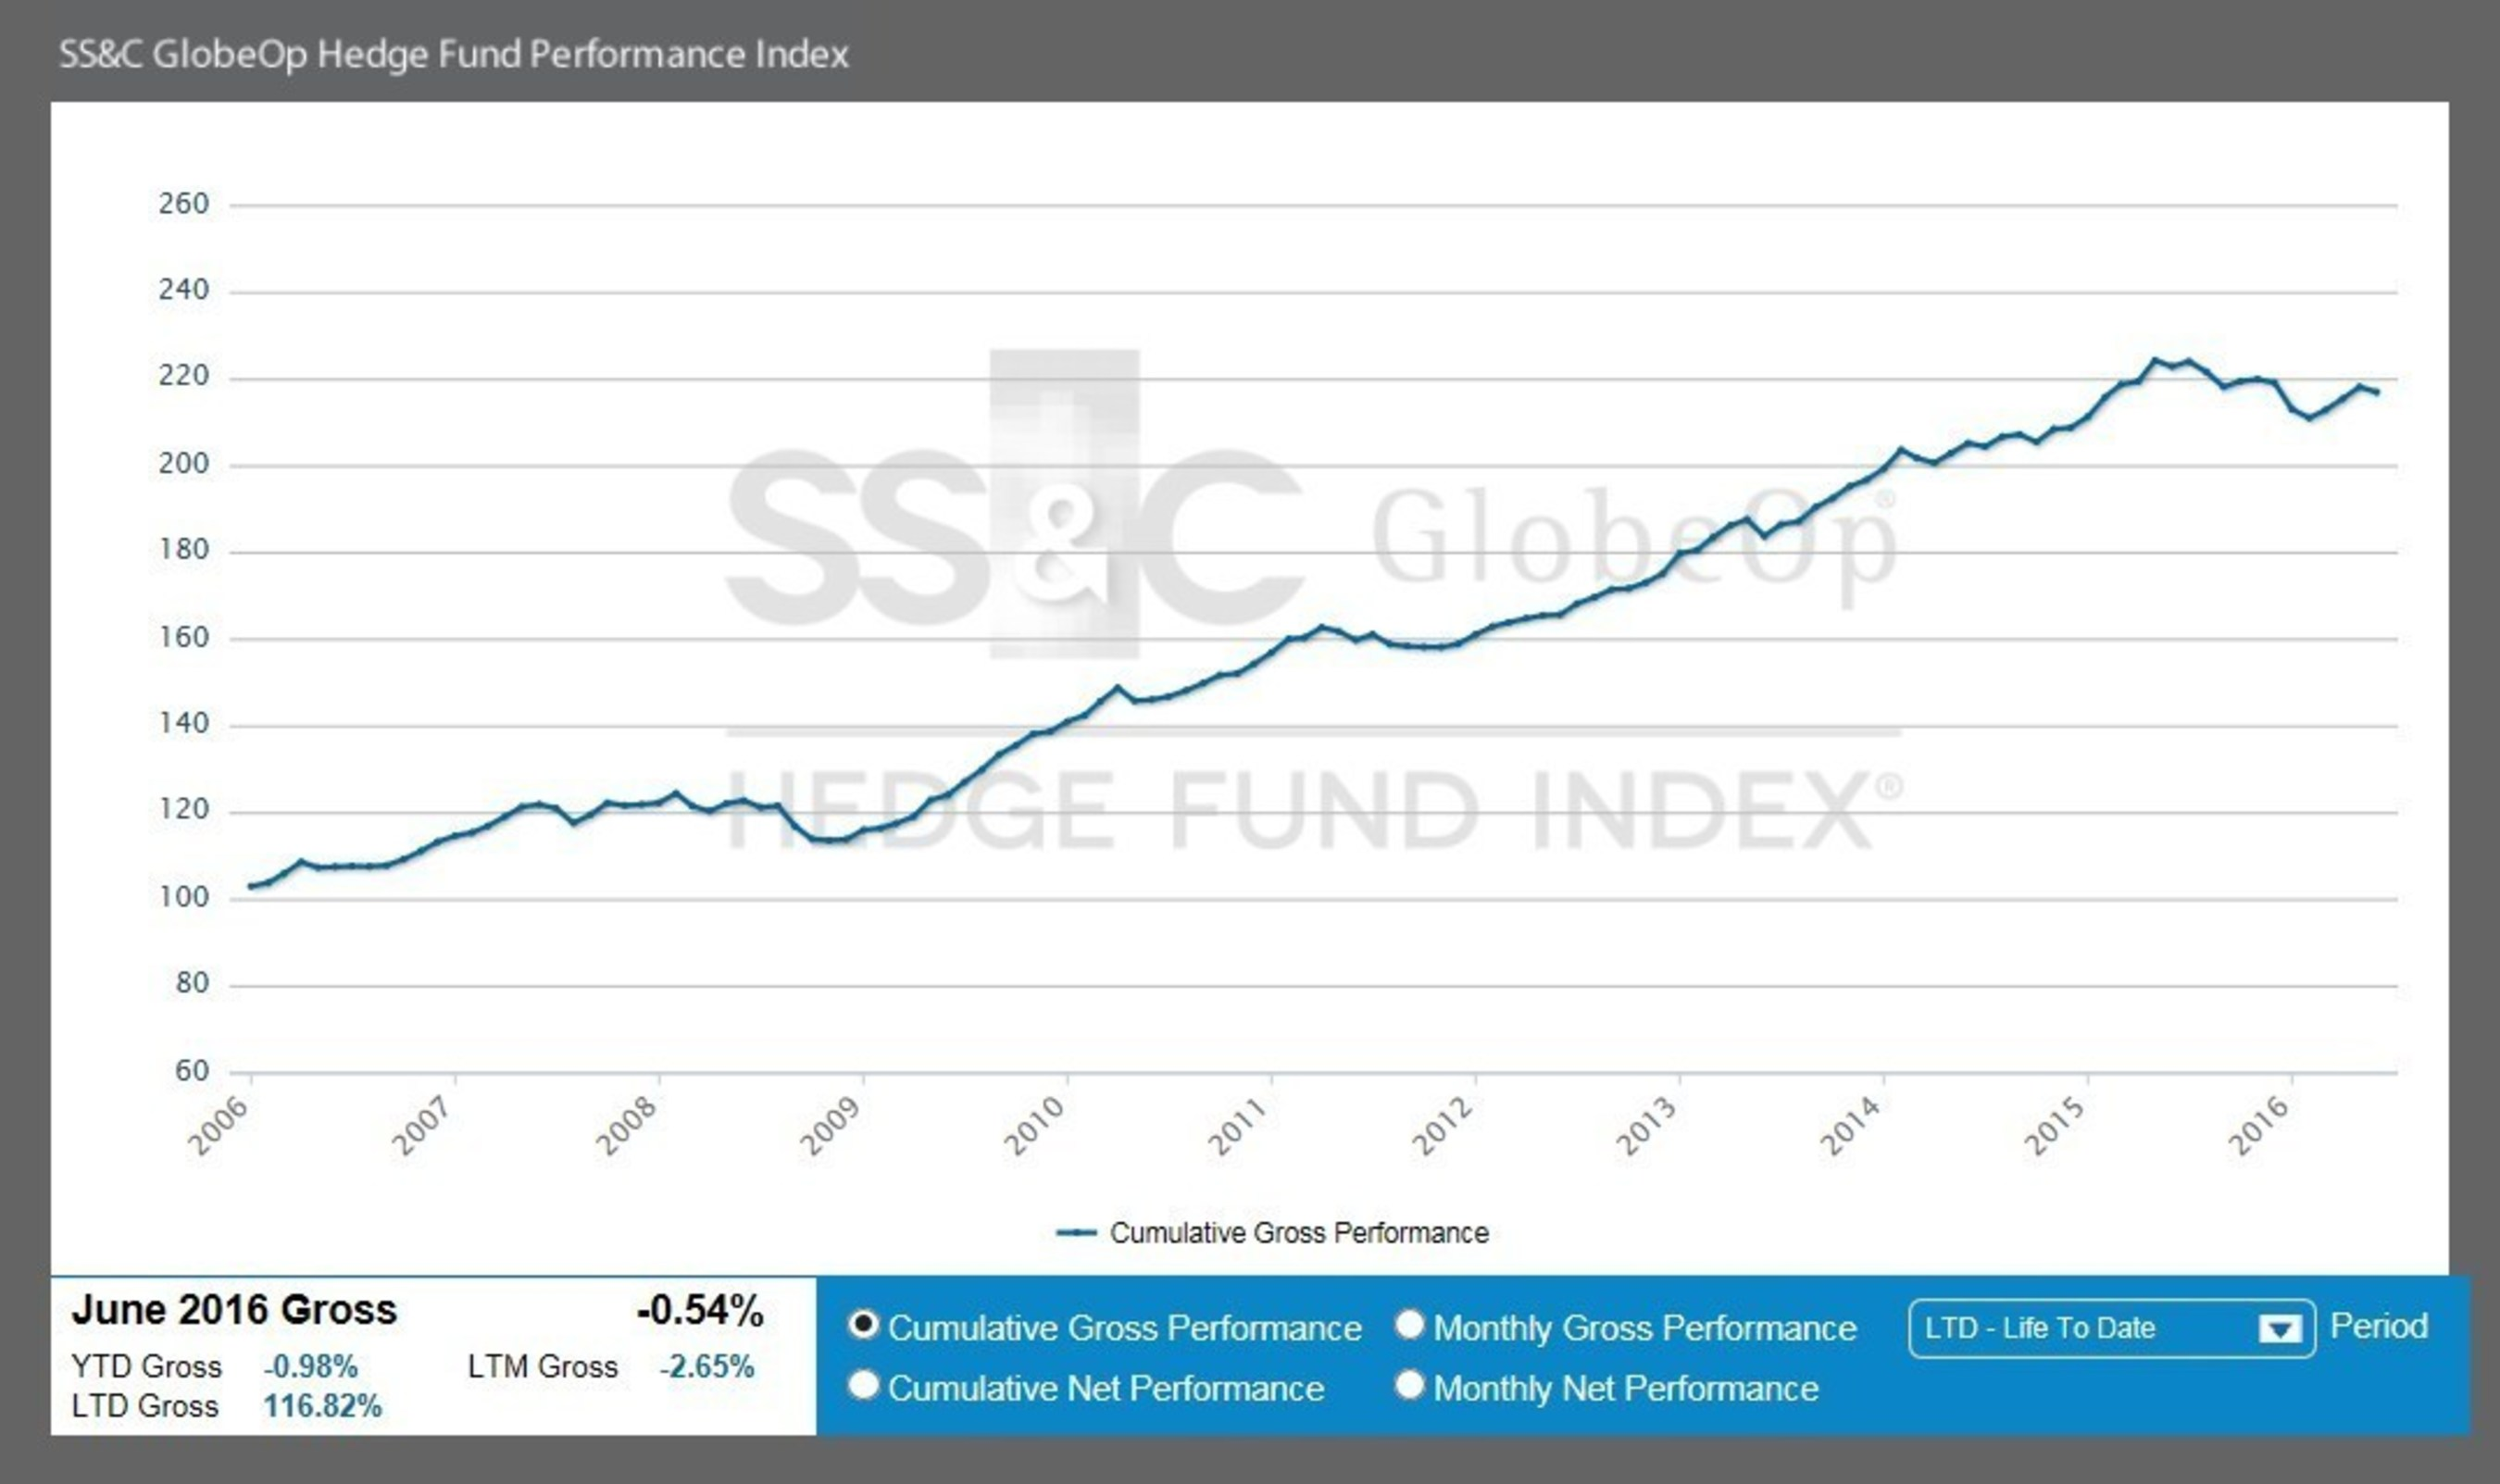 June SS&C GlobeOp Hedge Fund Performance Index